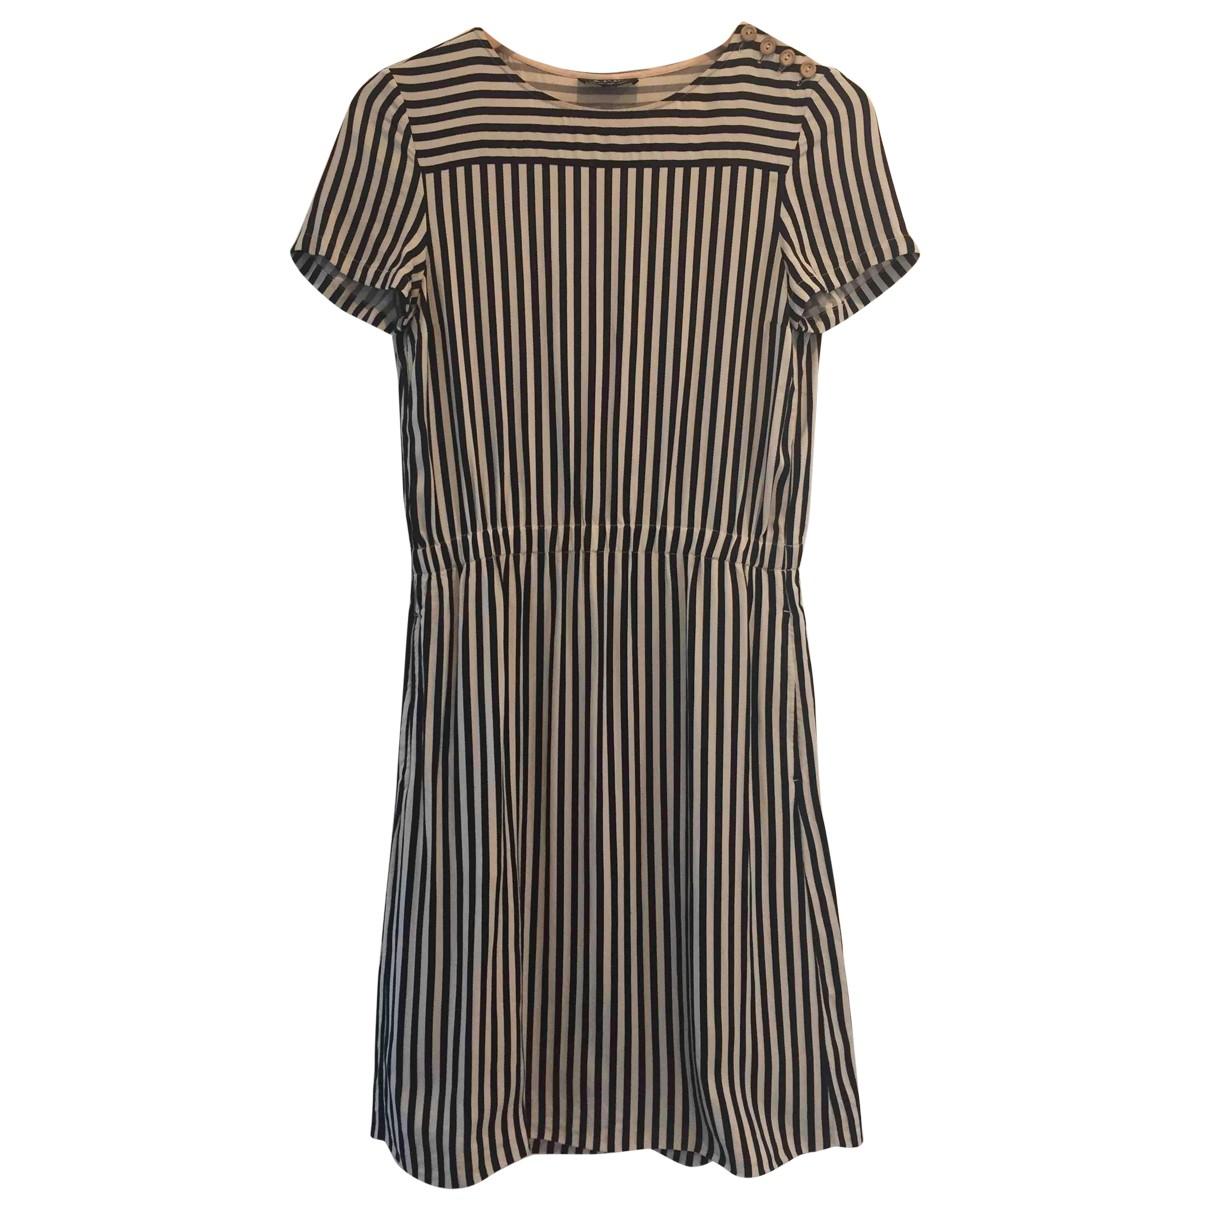 Apc \N Multicolour dress for Women 36 FR